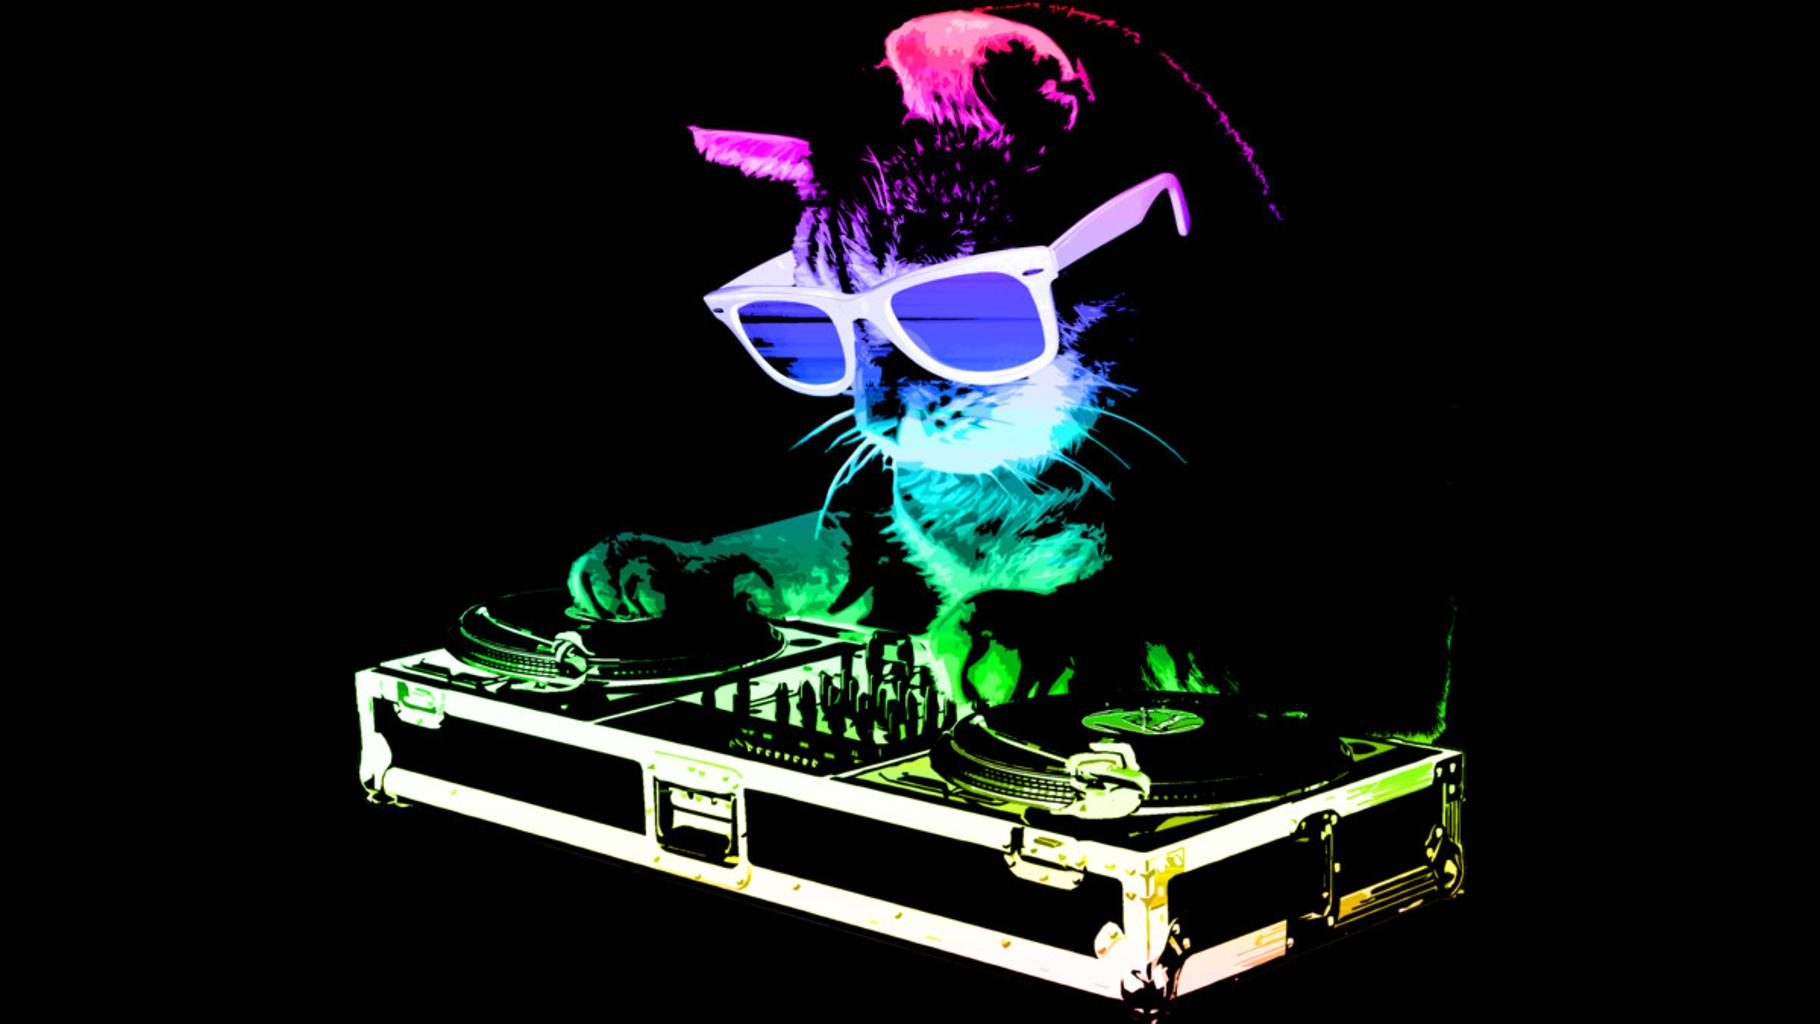 Design by Humans: HOUSE CAT (Rainbow DJ Kitty)